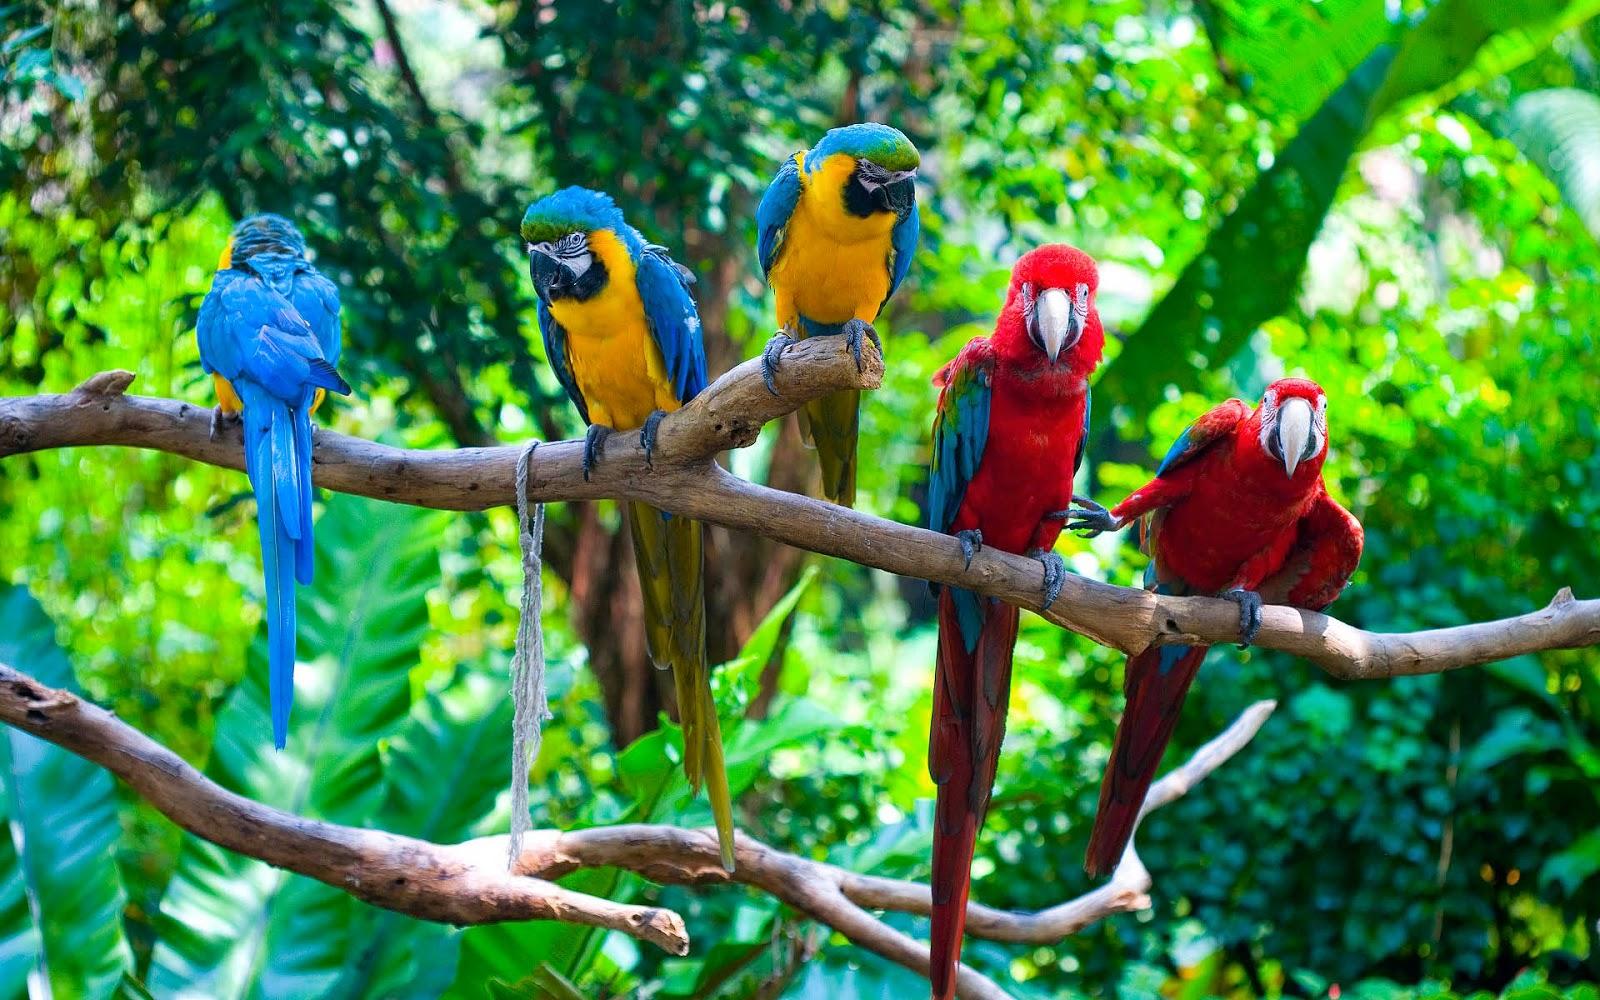 Wallpaper met papegaaien op tak